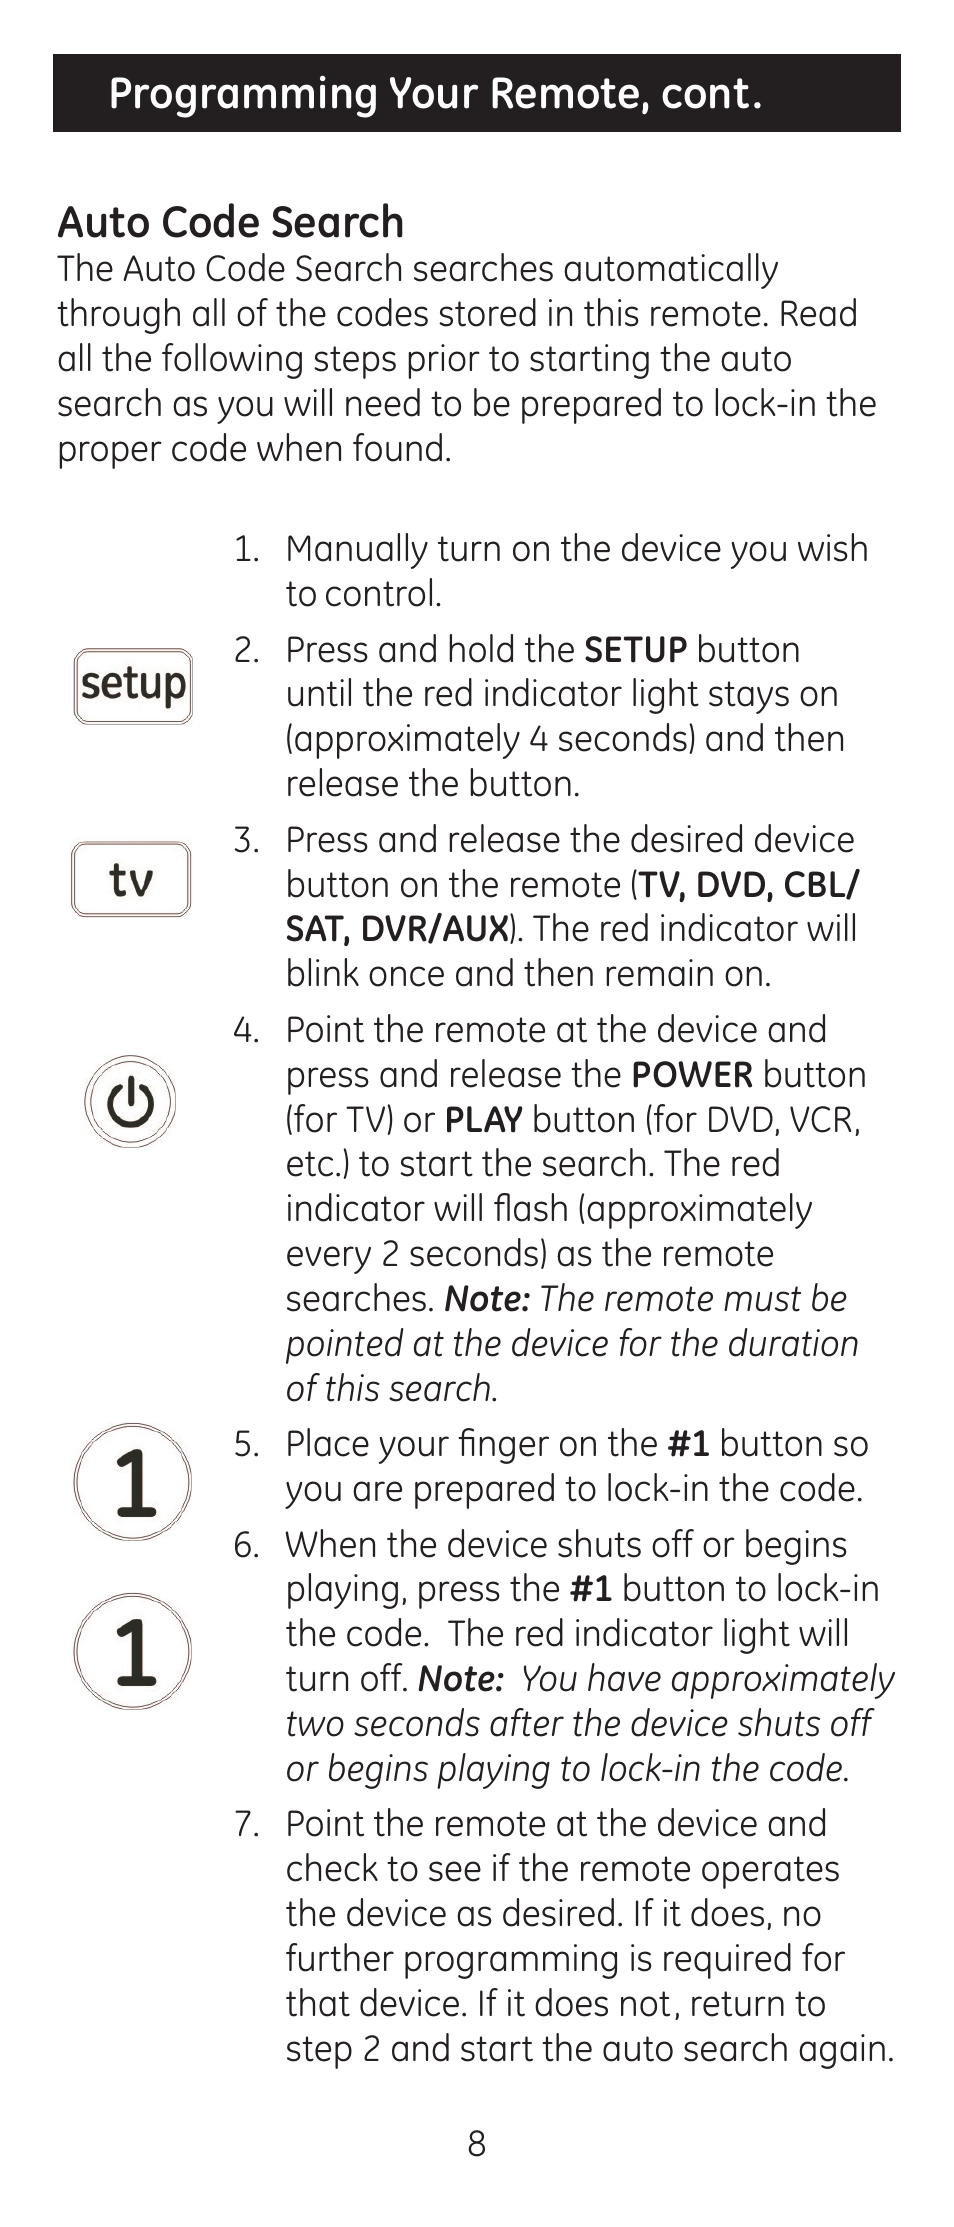 Programming your remote, cont  auto code search   GE 24929-v2